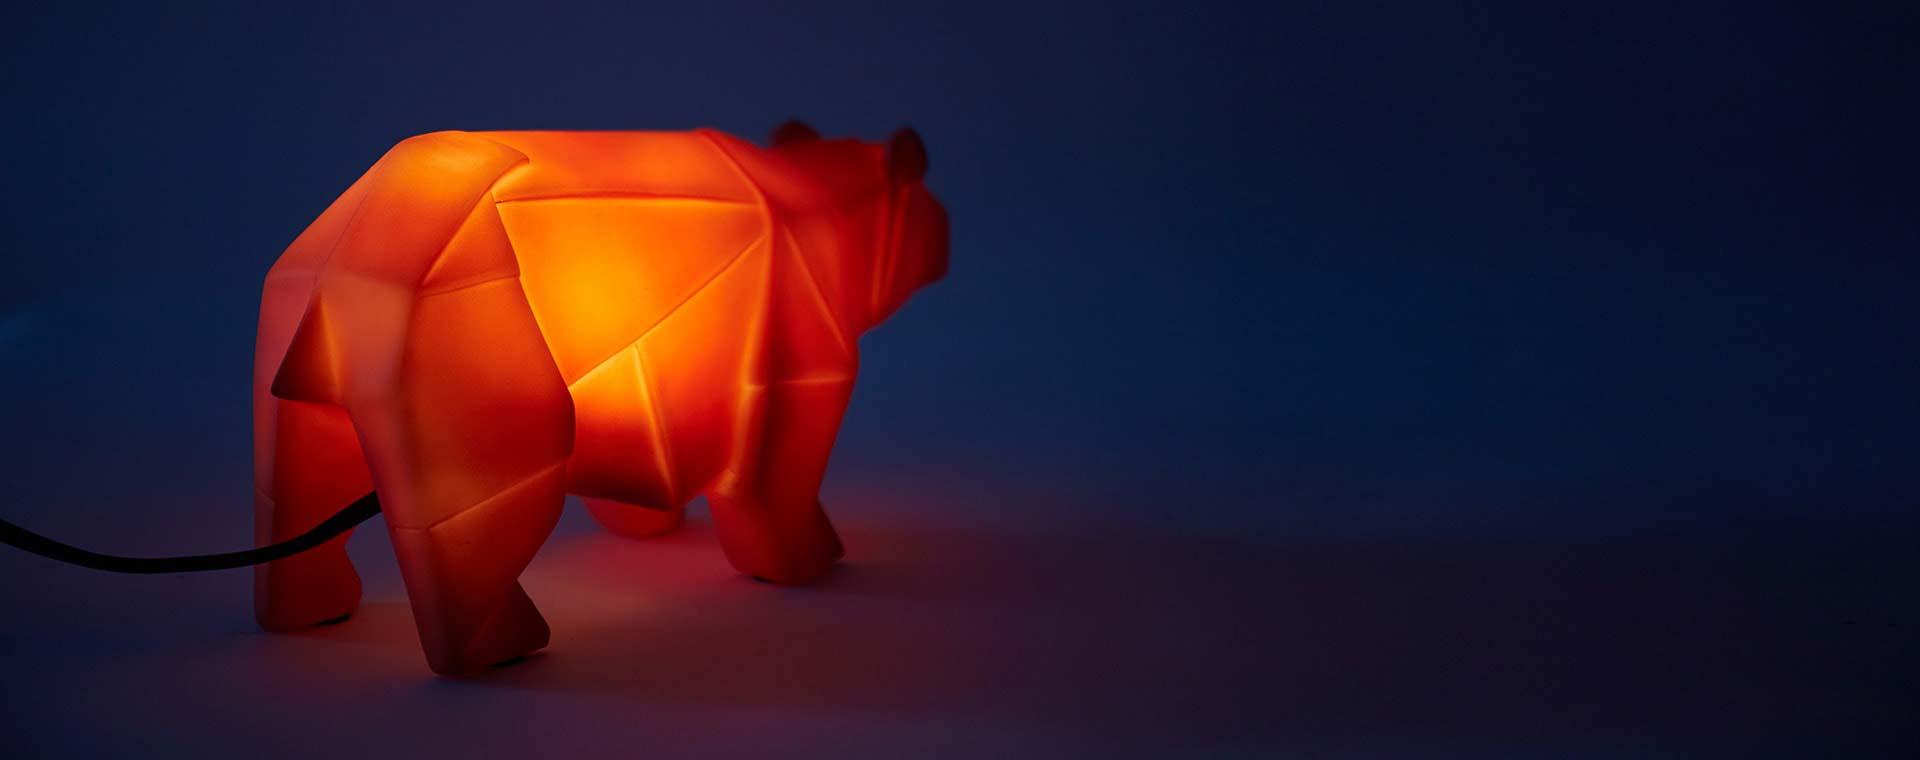 Orange House of Disaster Bear Lamp